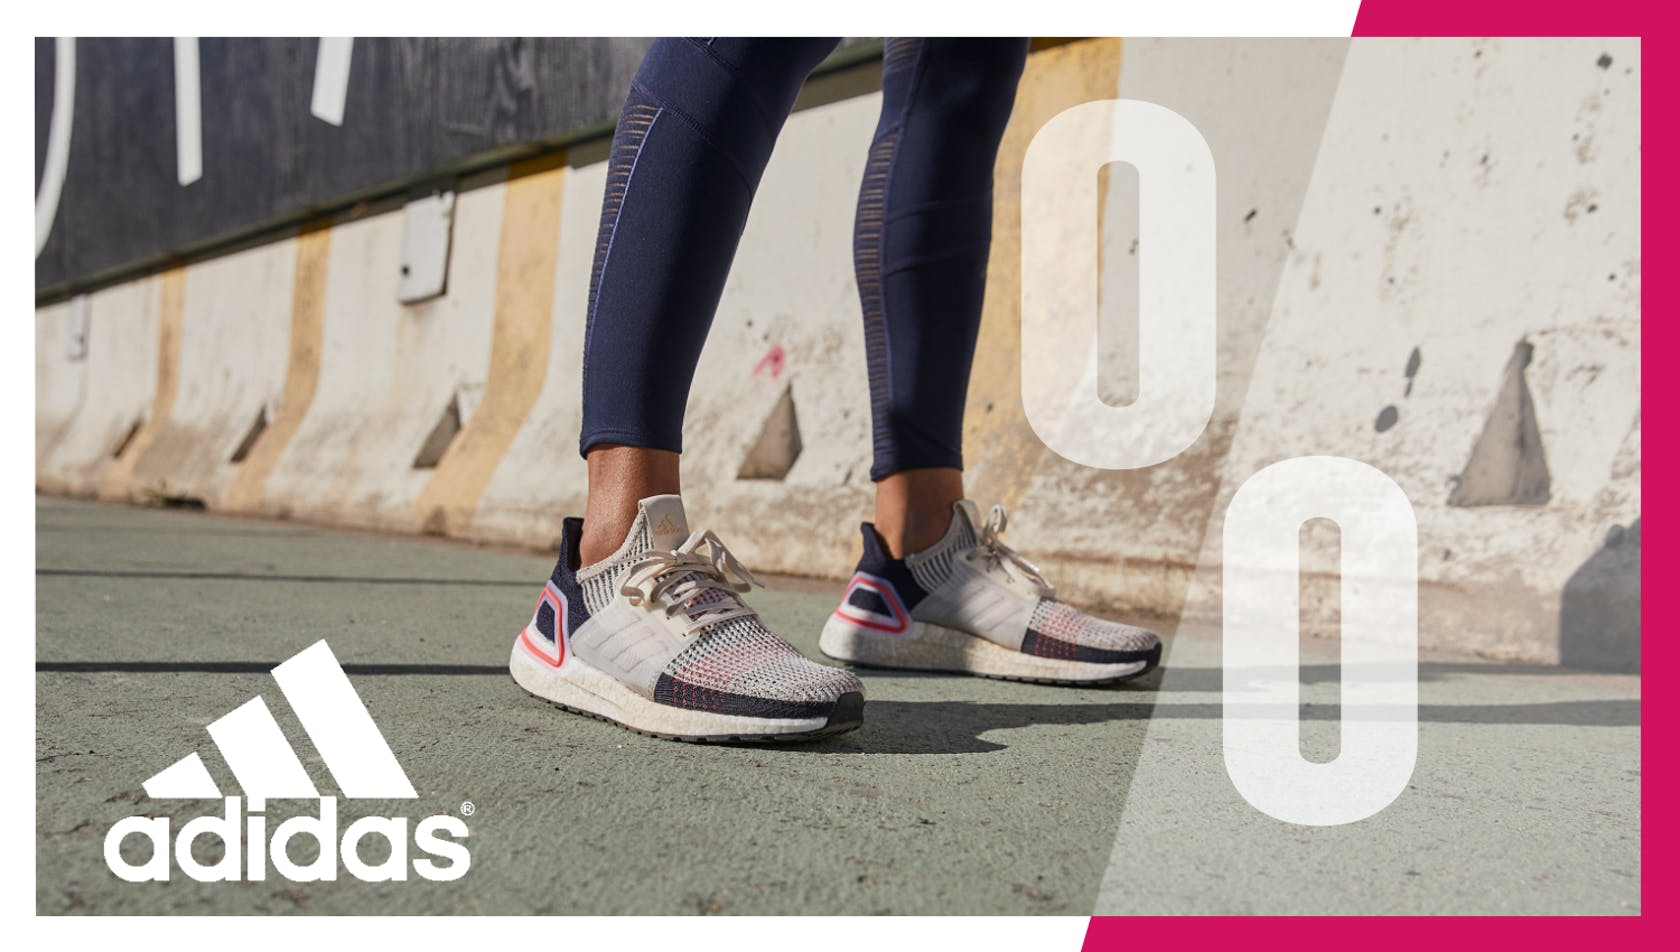 Adidas Onlineshop Sale